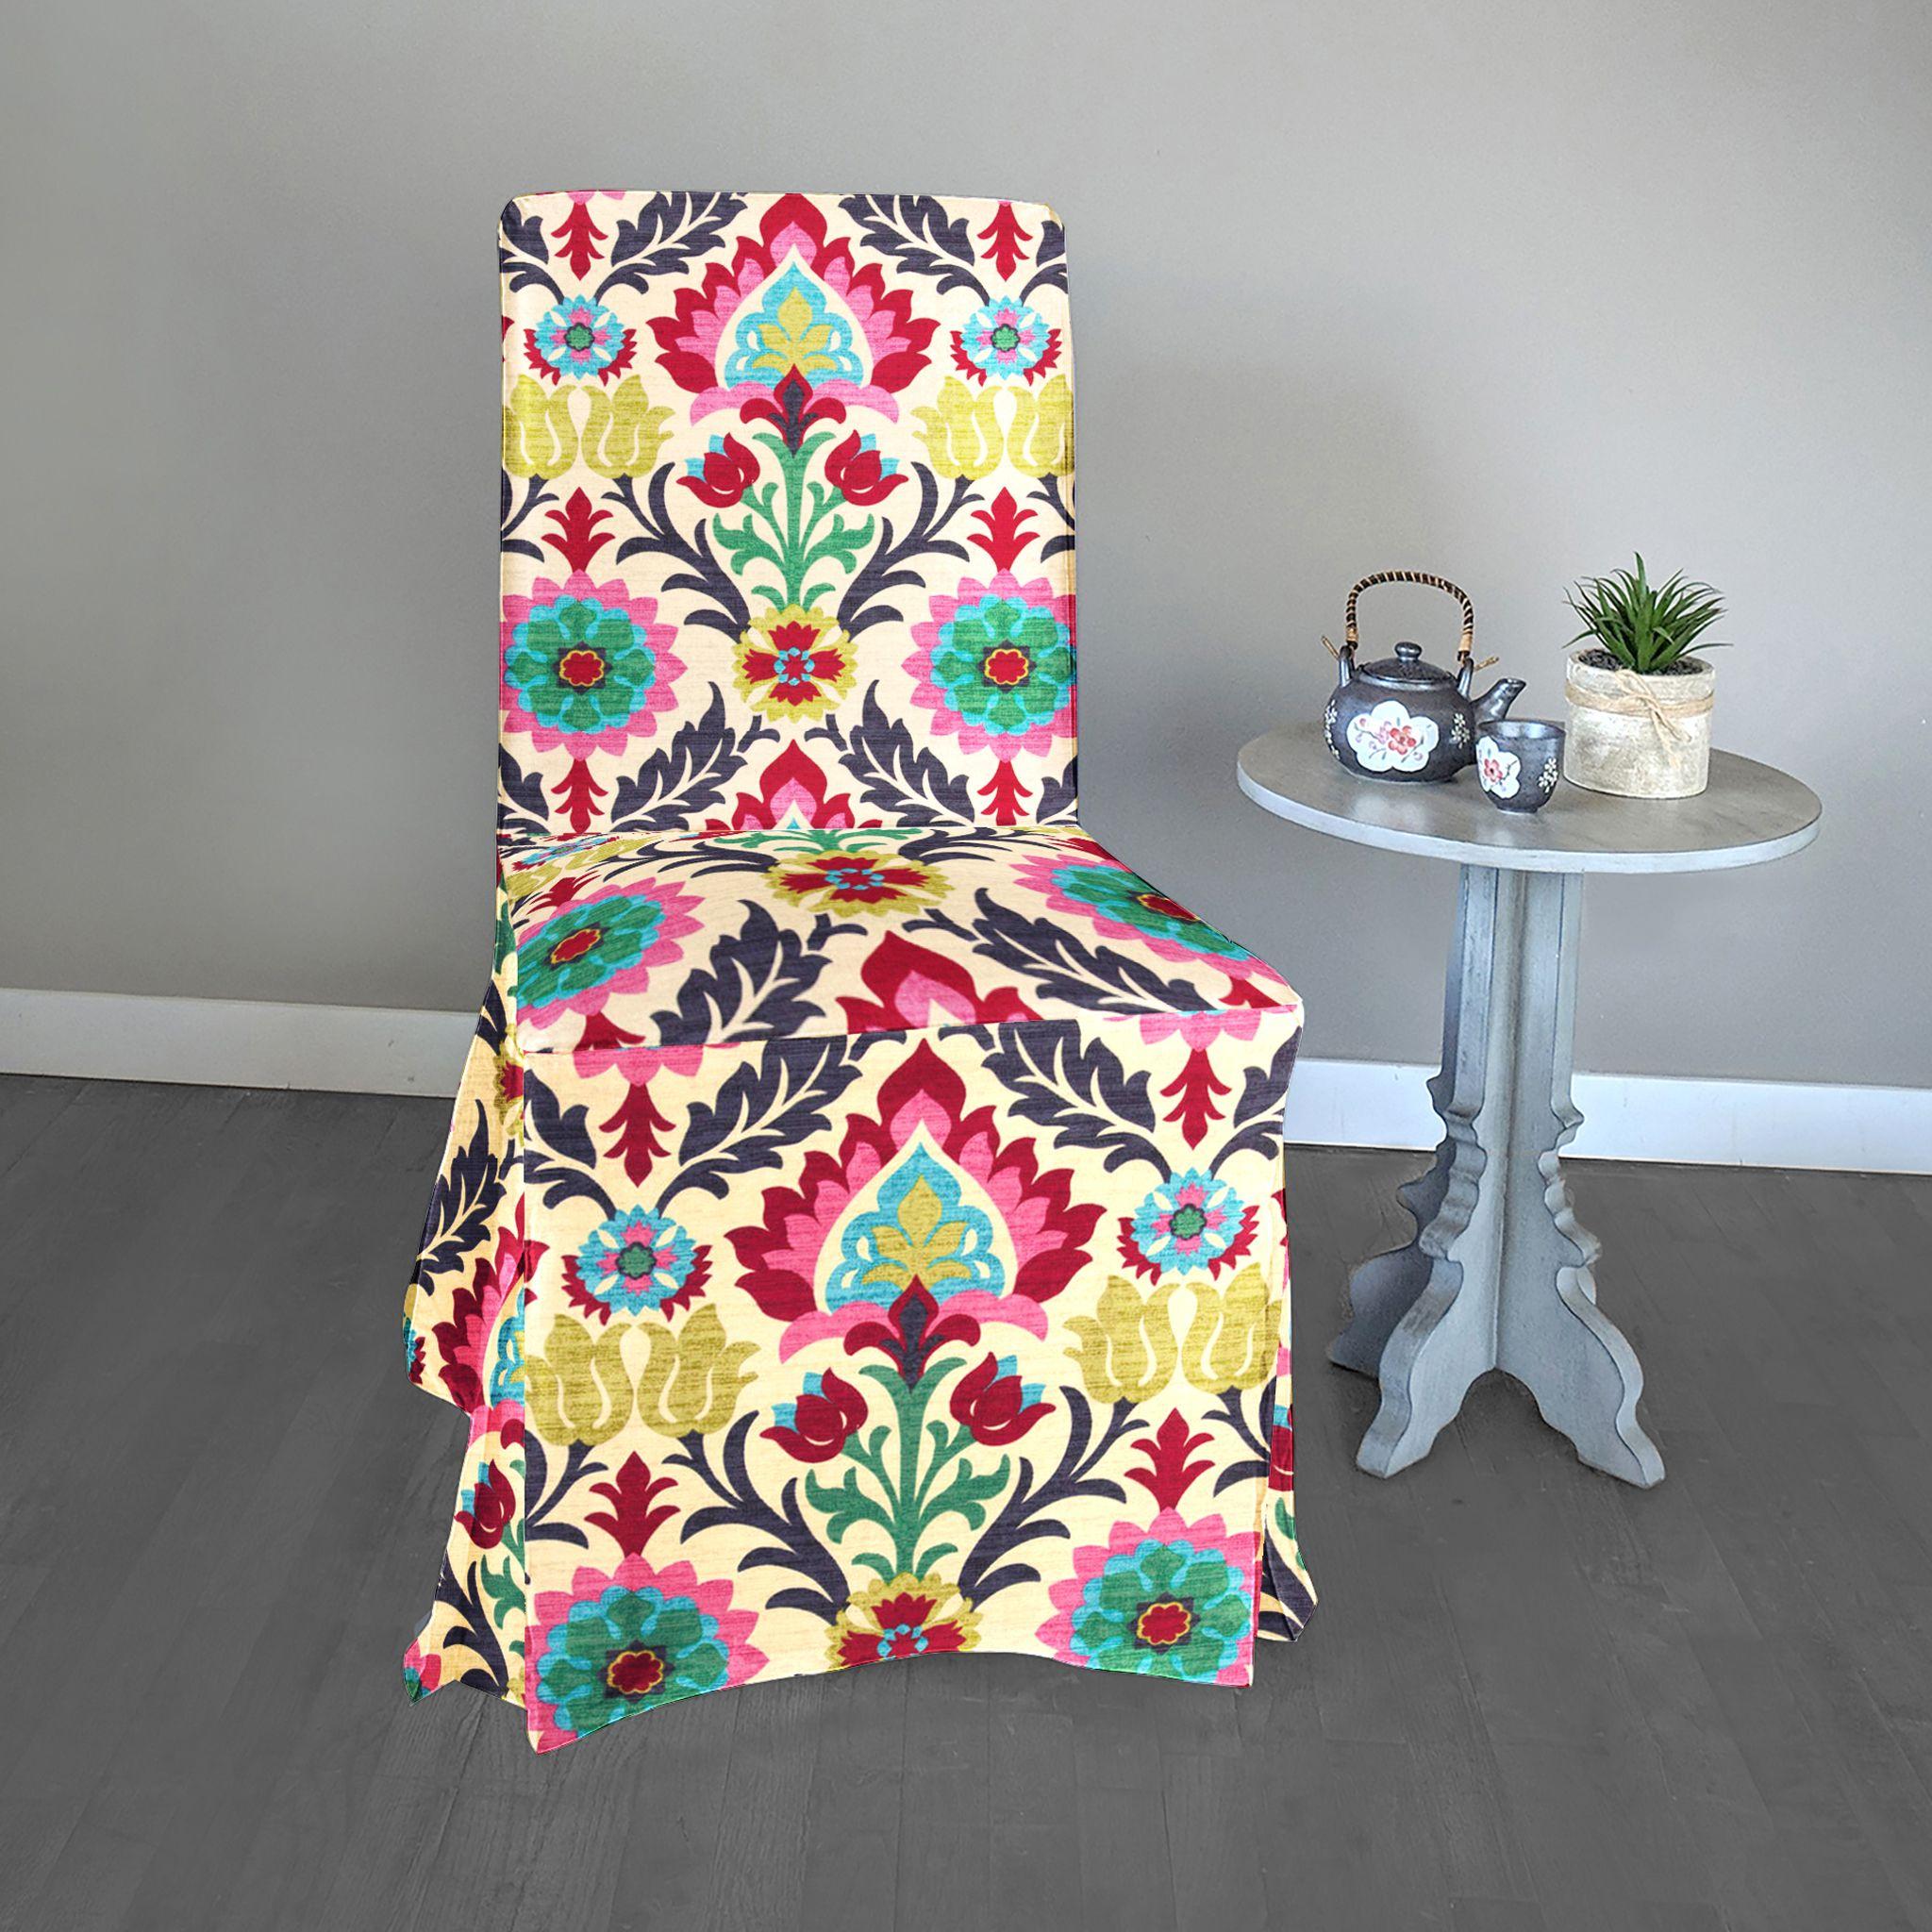 IKEA Henriksdal Dining Chair Cover, Santa Maria Desert